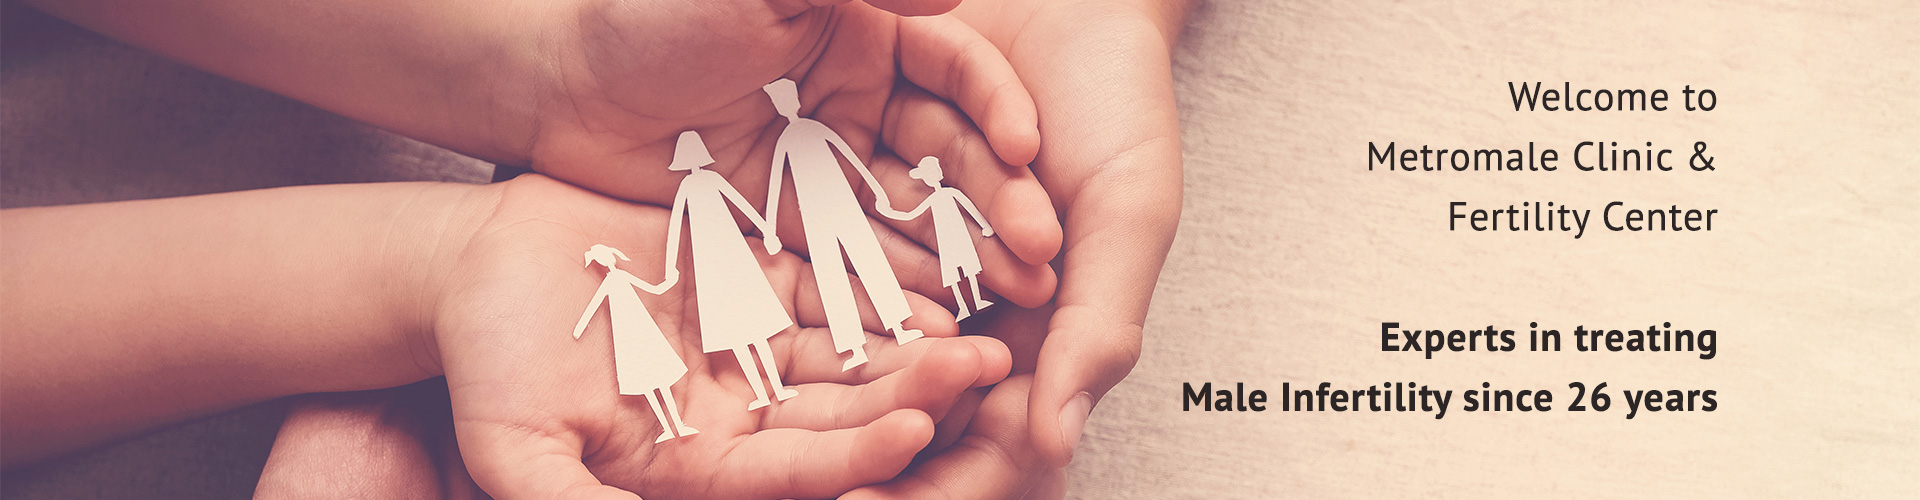 Metromale Clinic & Fertility Center - Treating MEn infertility since 26 years